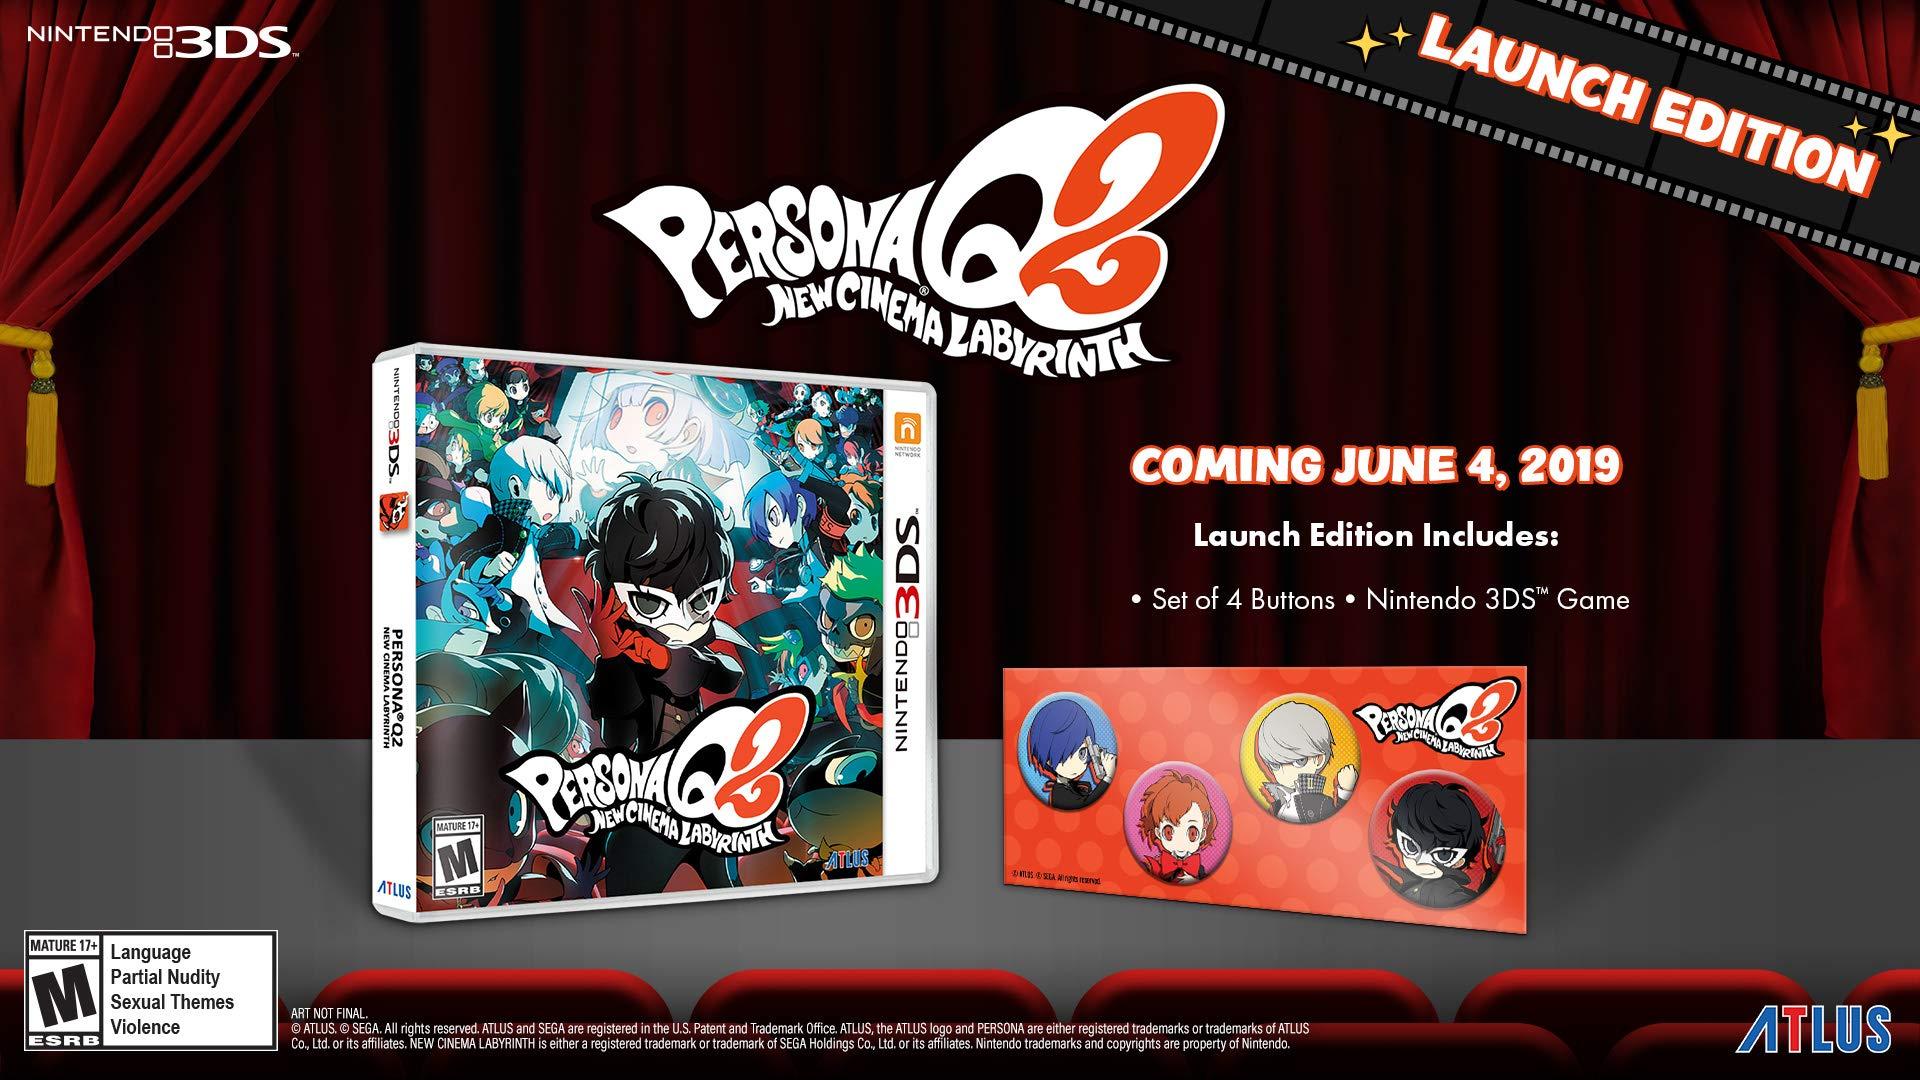 Persona Q2: New Cinema Labyrinth Launch Edition - Nintendo 3DS